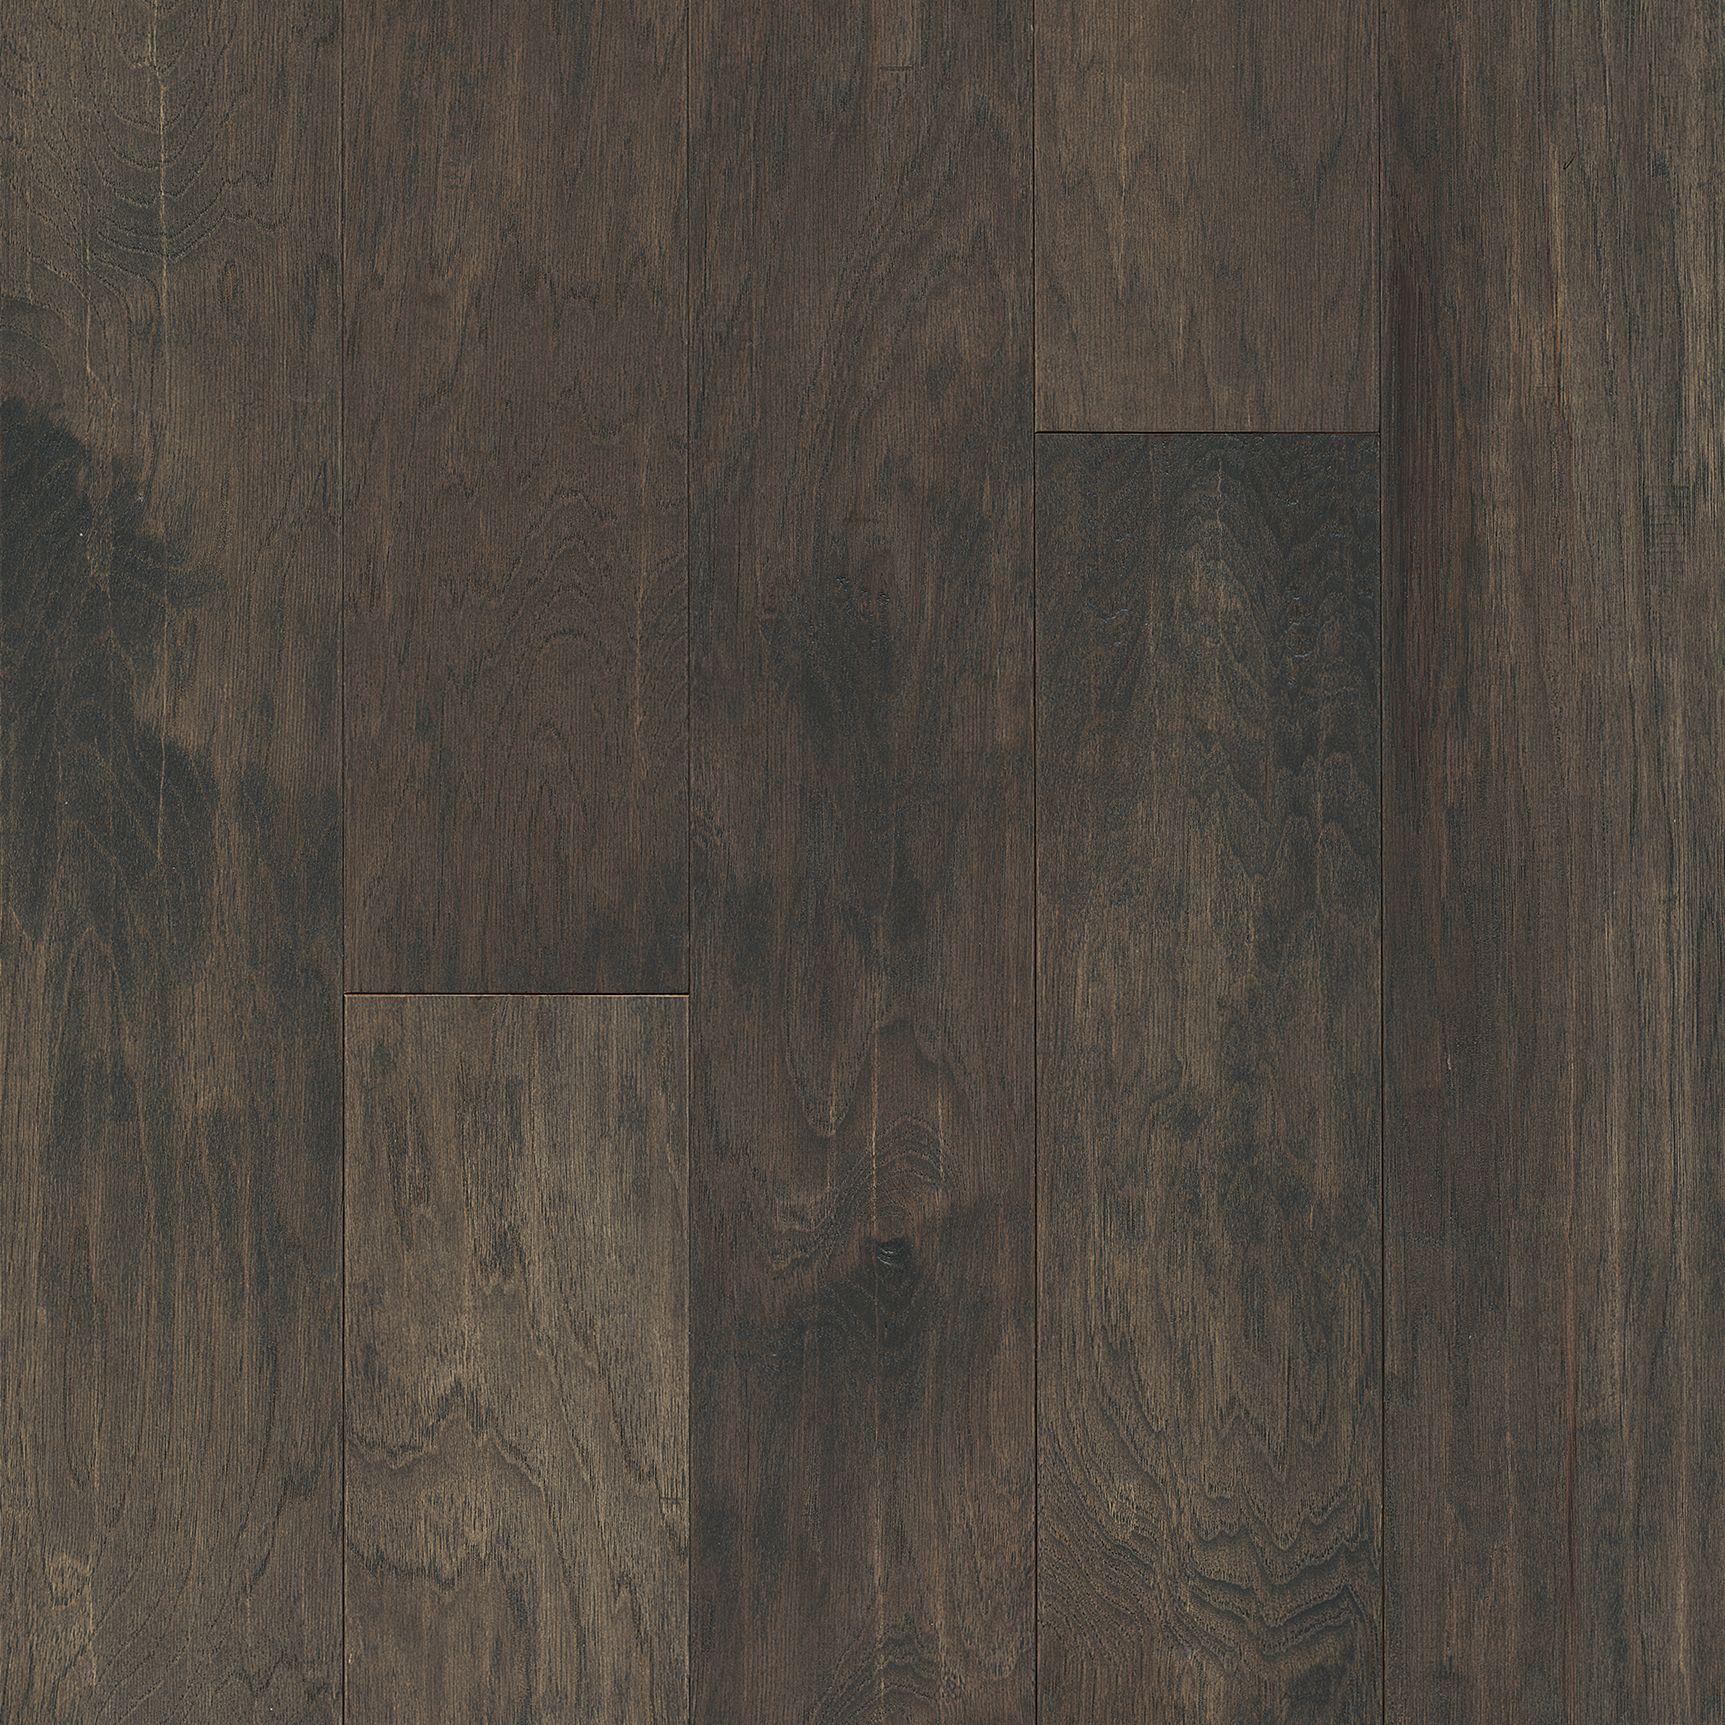 Armstrong Gold Rush Maple 20321 Shop Hardwood Flooring